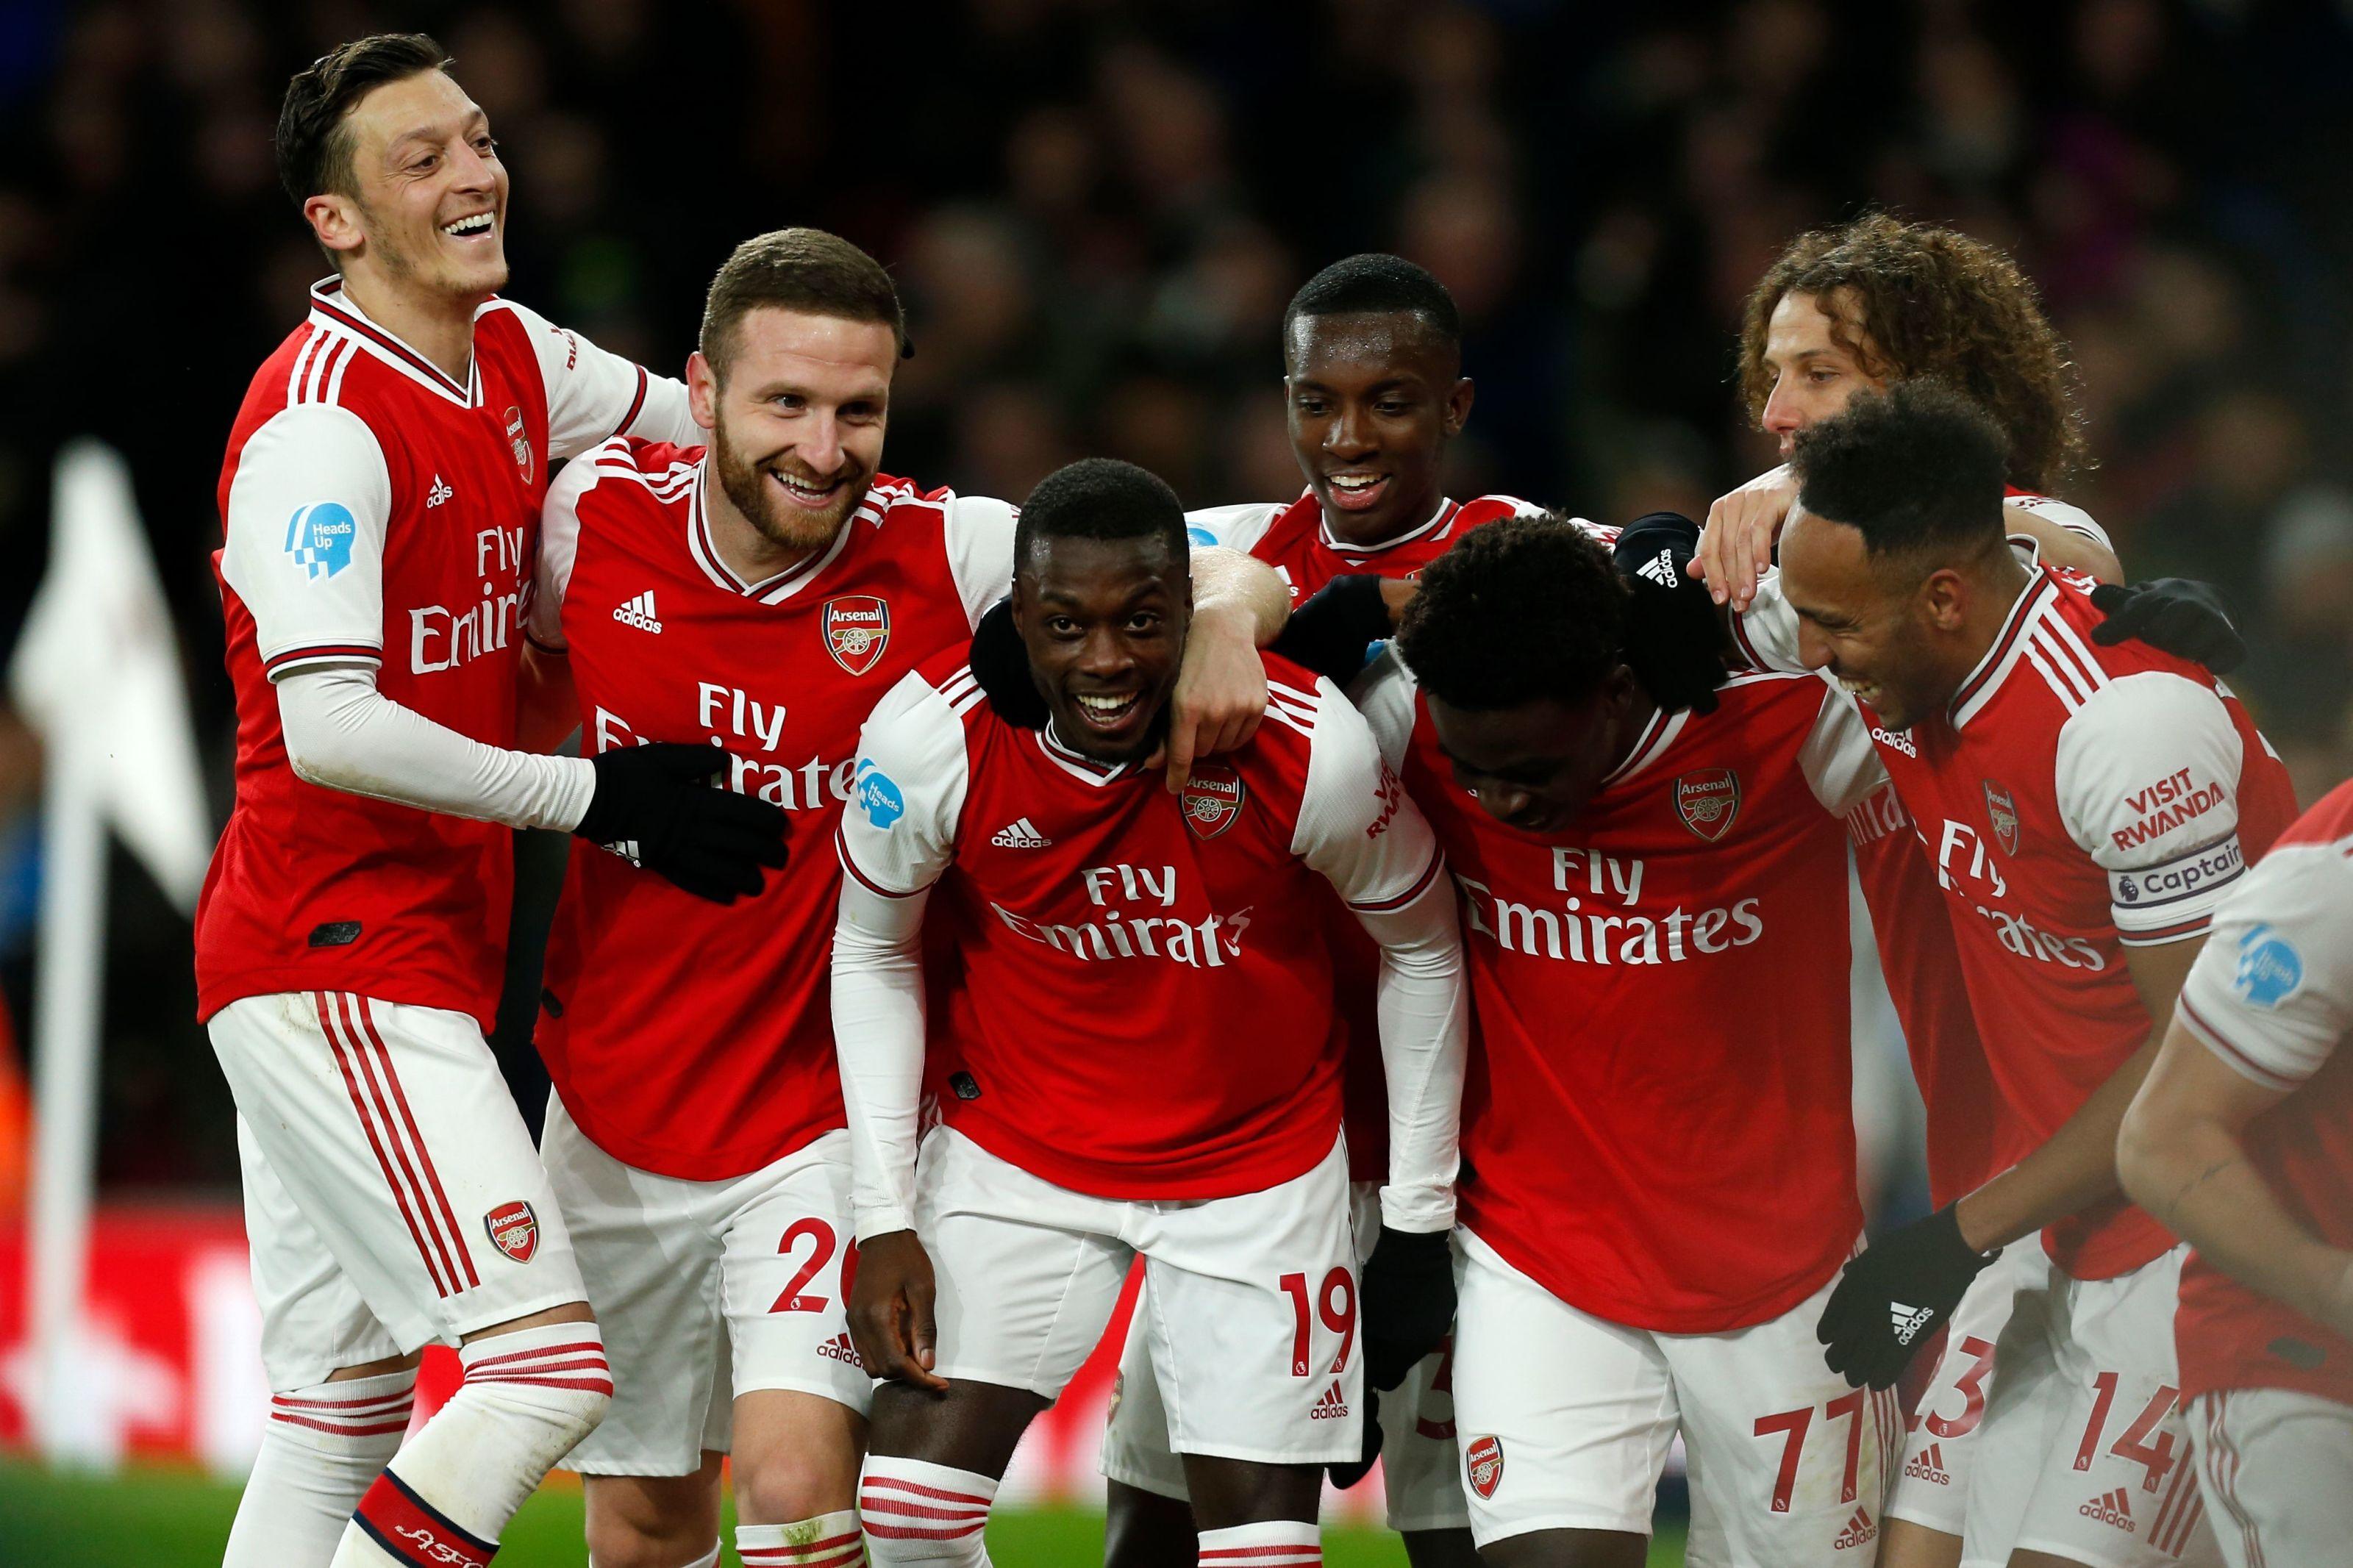 Arsenal vs Newcastle player ratings: Last summer's dream